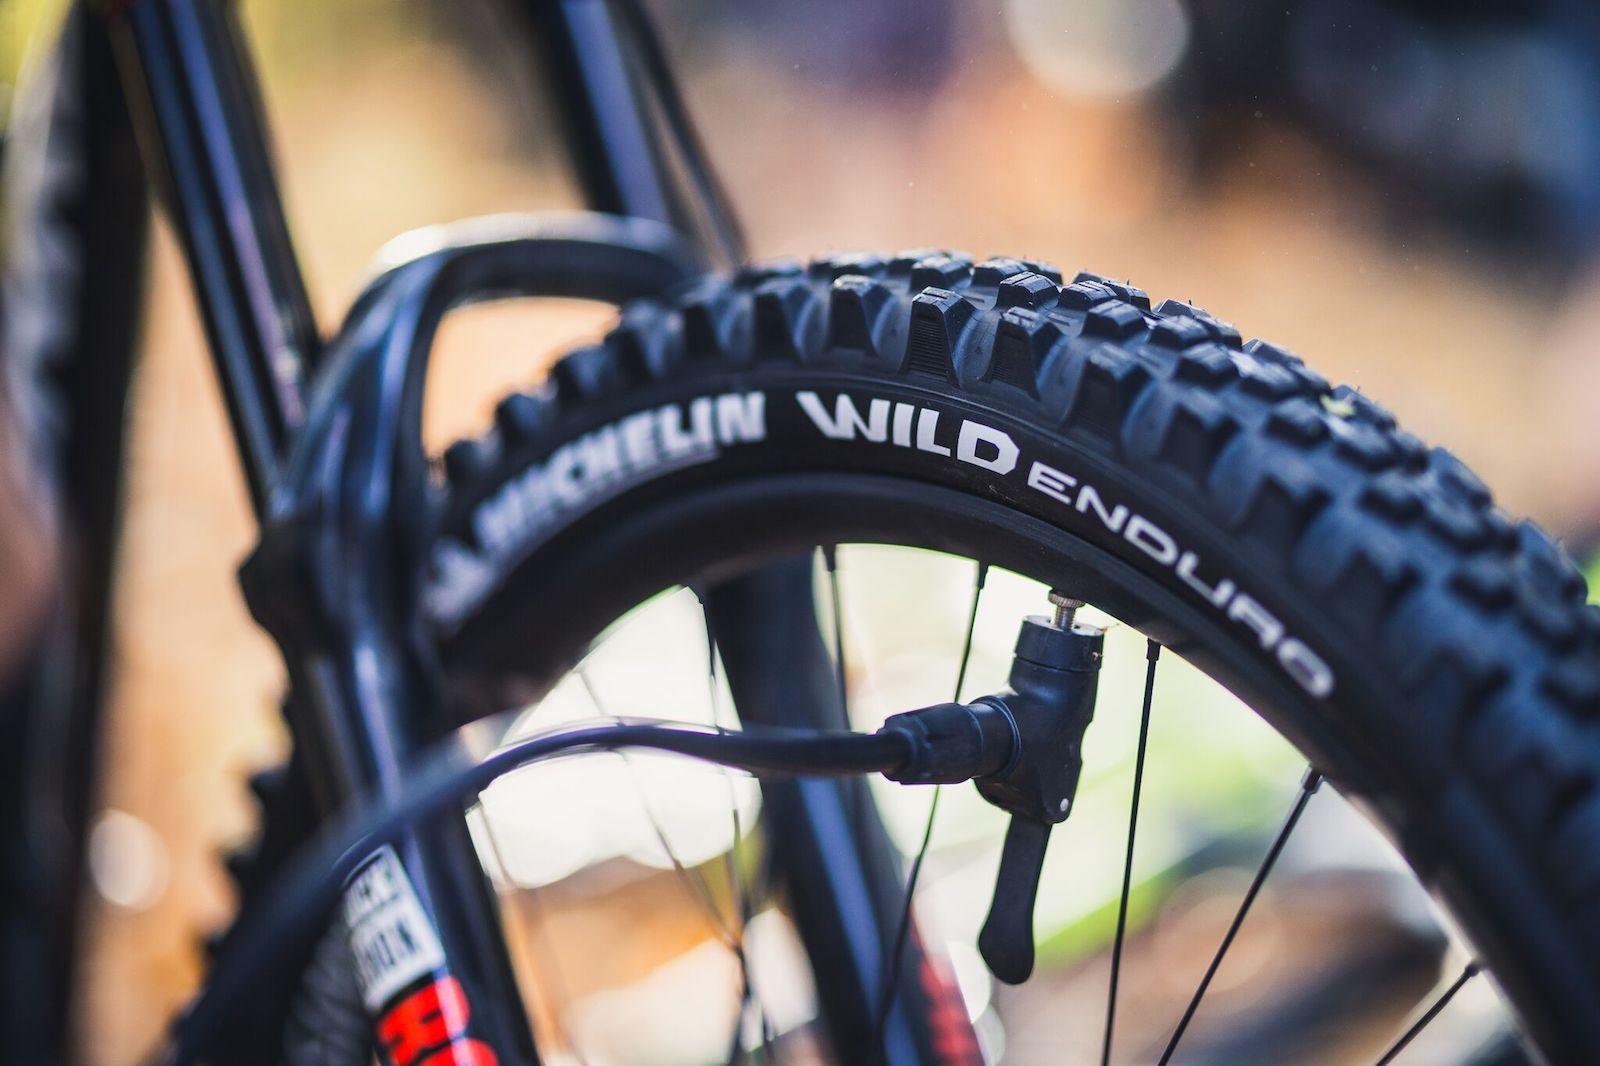 94d092fa6ff MTB-MAG.COM - Mountain Bike Magazine | [First Ride] The New Michelin ...